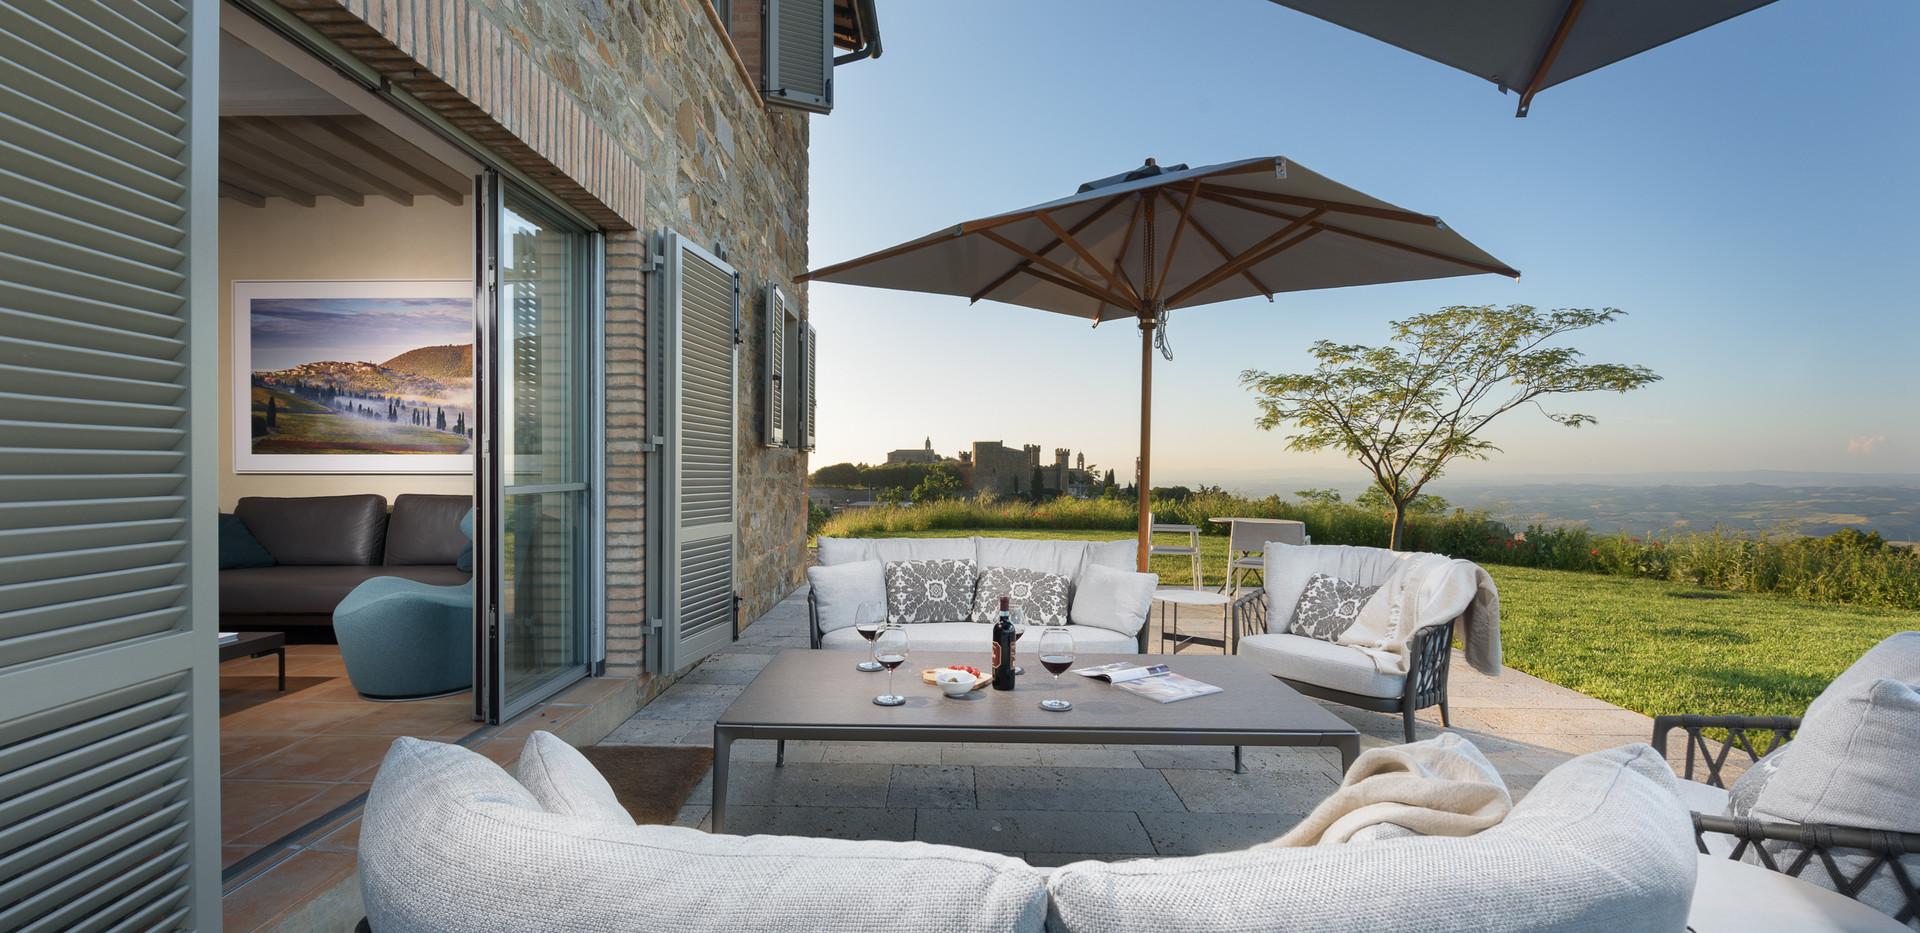 WEB Villa Palazzetta, Montalcino 2019-67